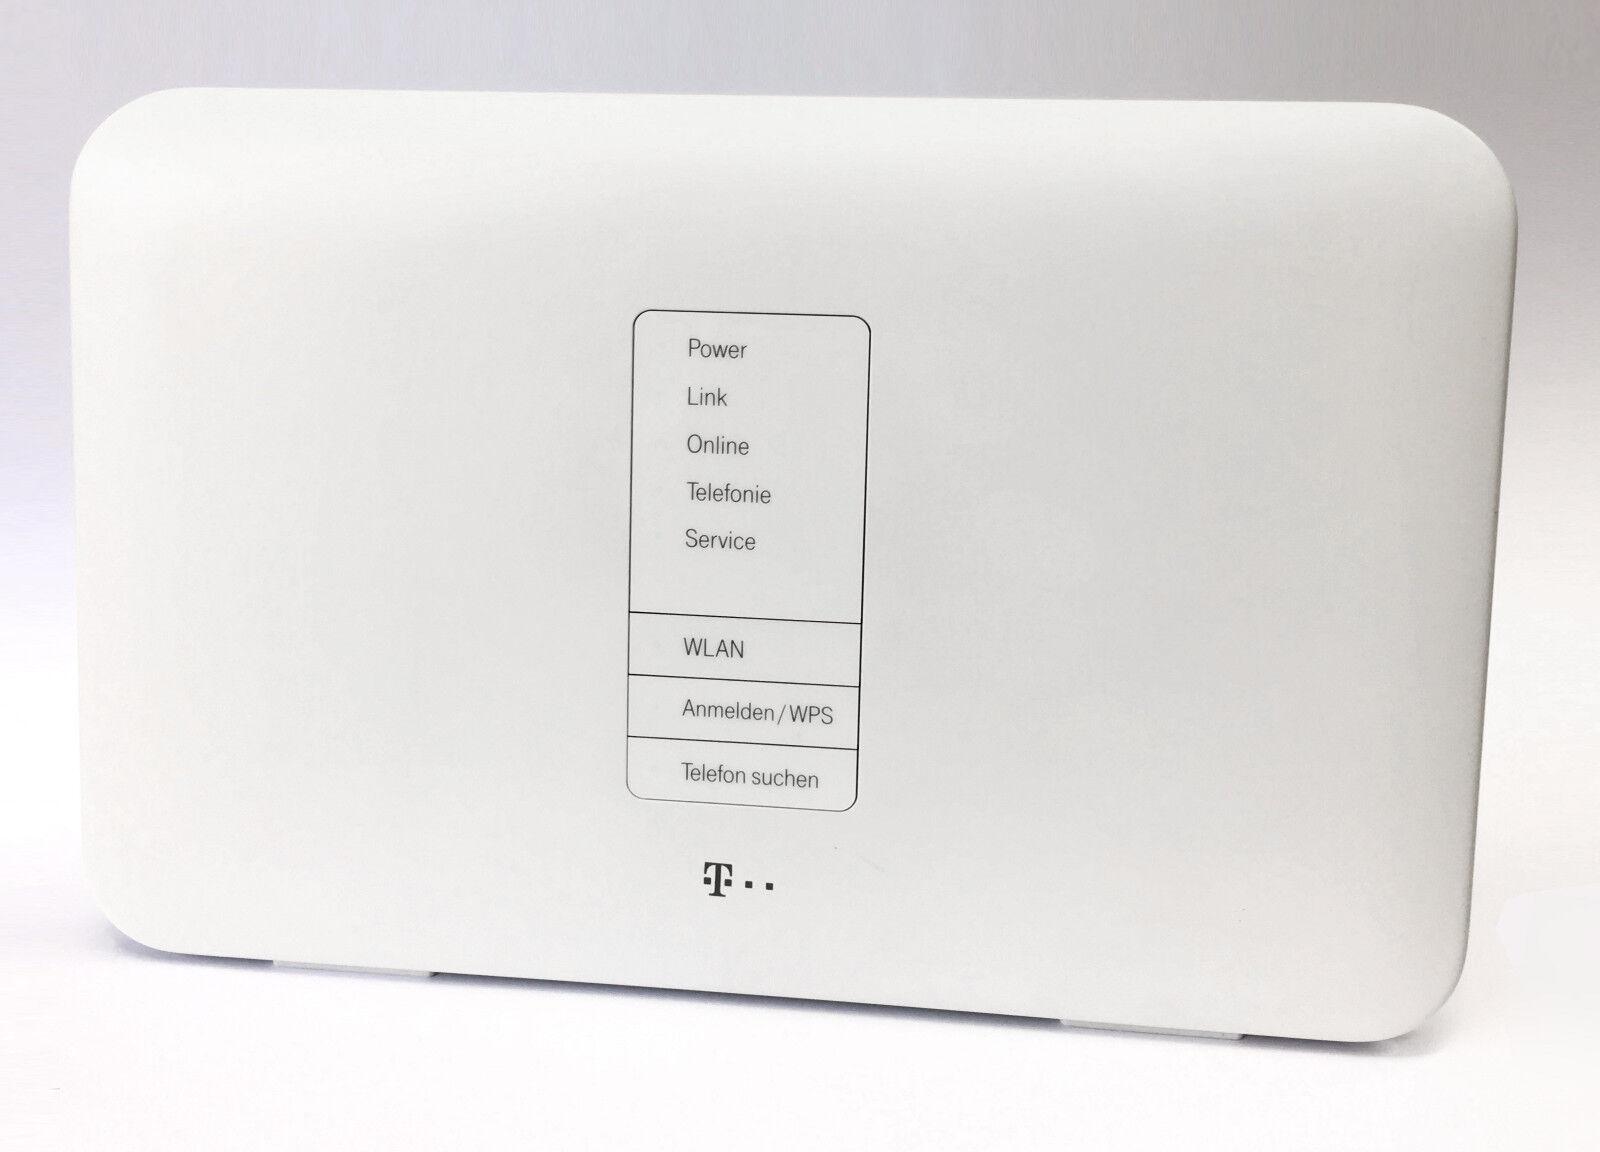 Telekom Speedport W 724V 1300 Mbps 4-Port 1000 Mbps WLAN Router DECT (40267955)